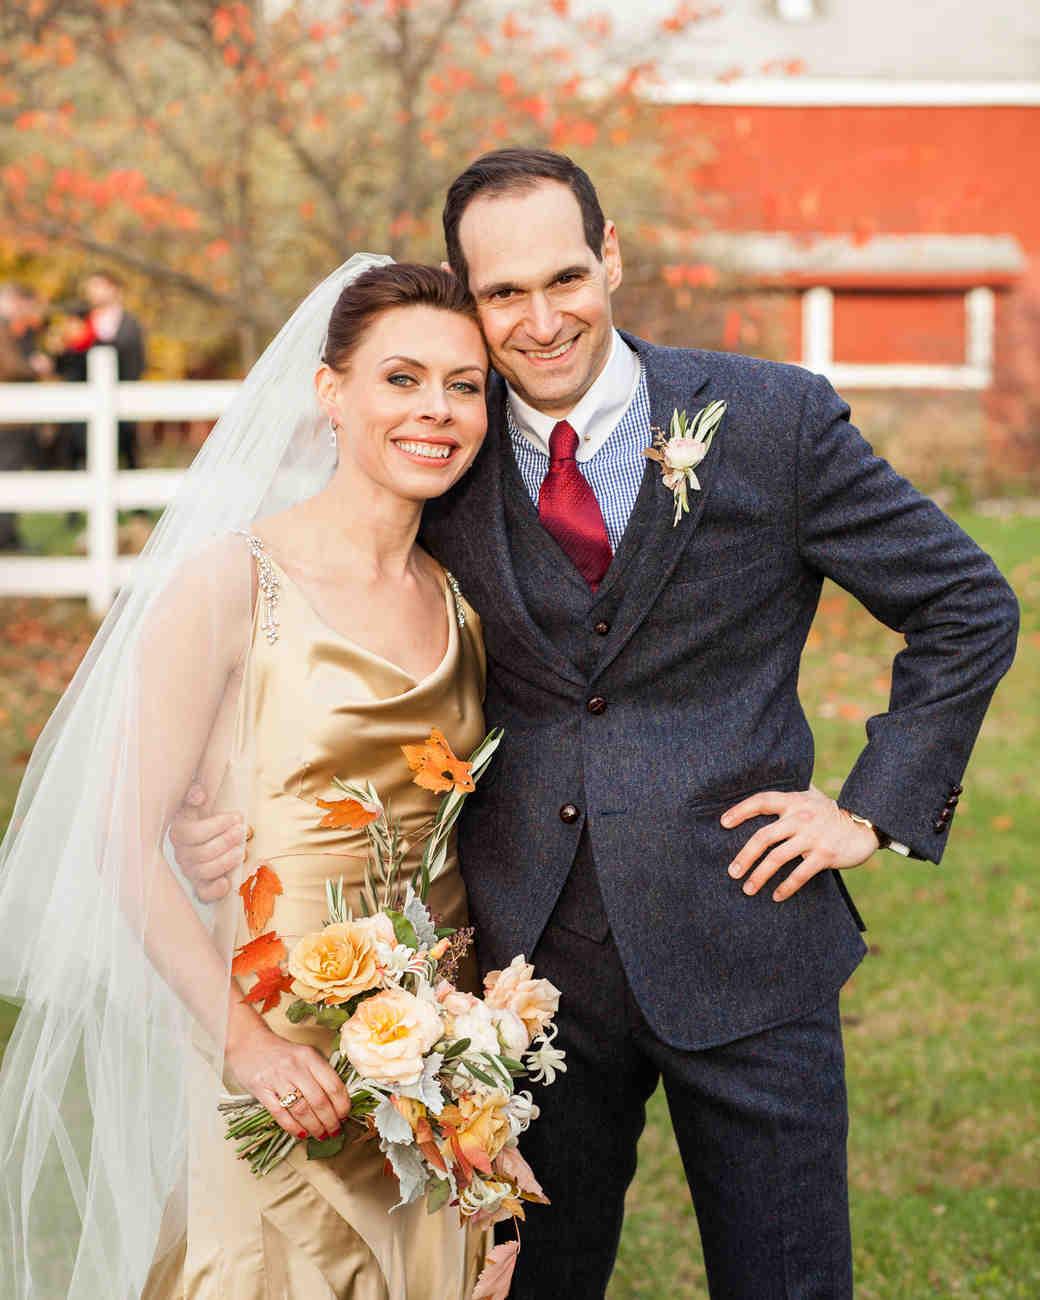 hanna-jimm-wedding-couple-138-s111413-0814.jpg